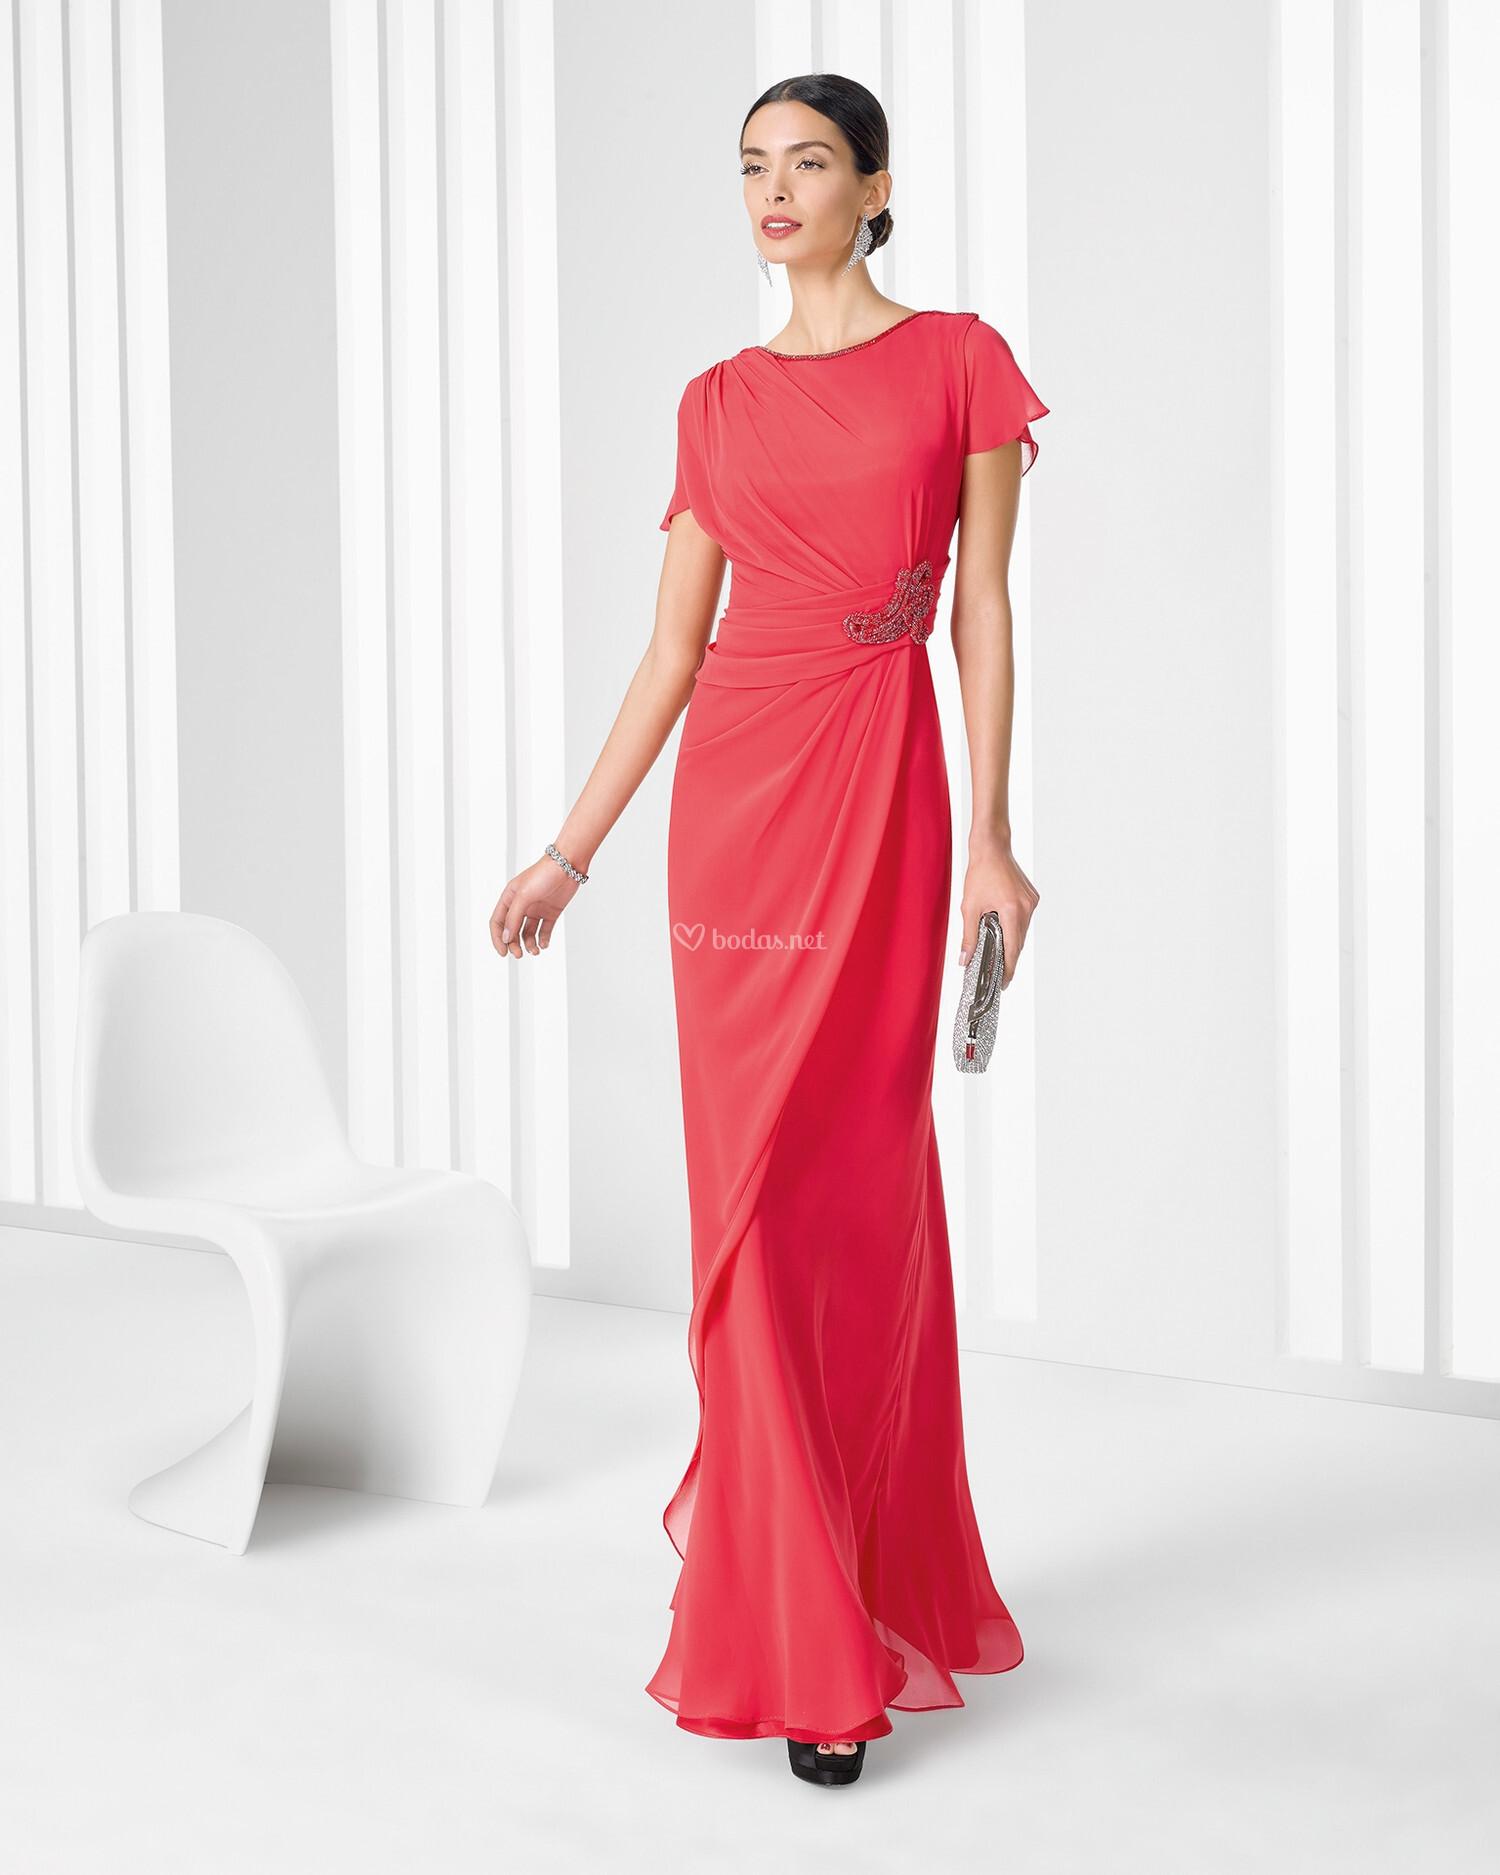 Vestido de fiesta de rosa clar 2016 9t222 cocktail rosa for Cocktail 222